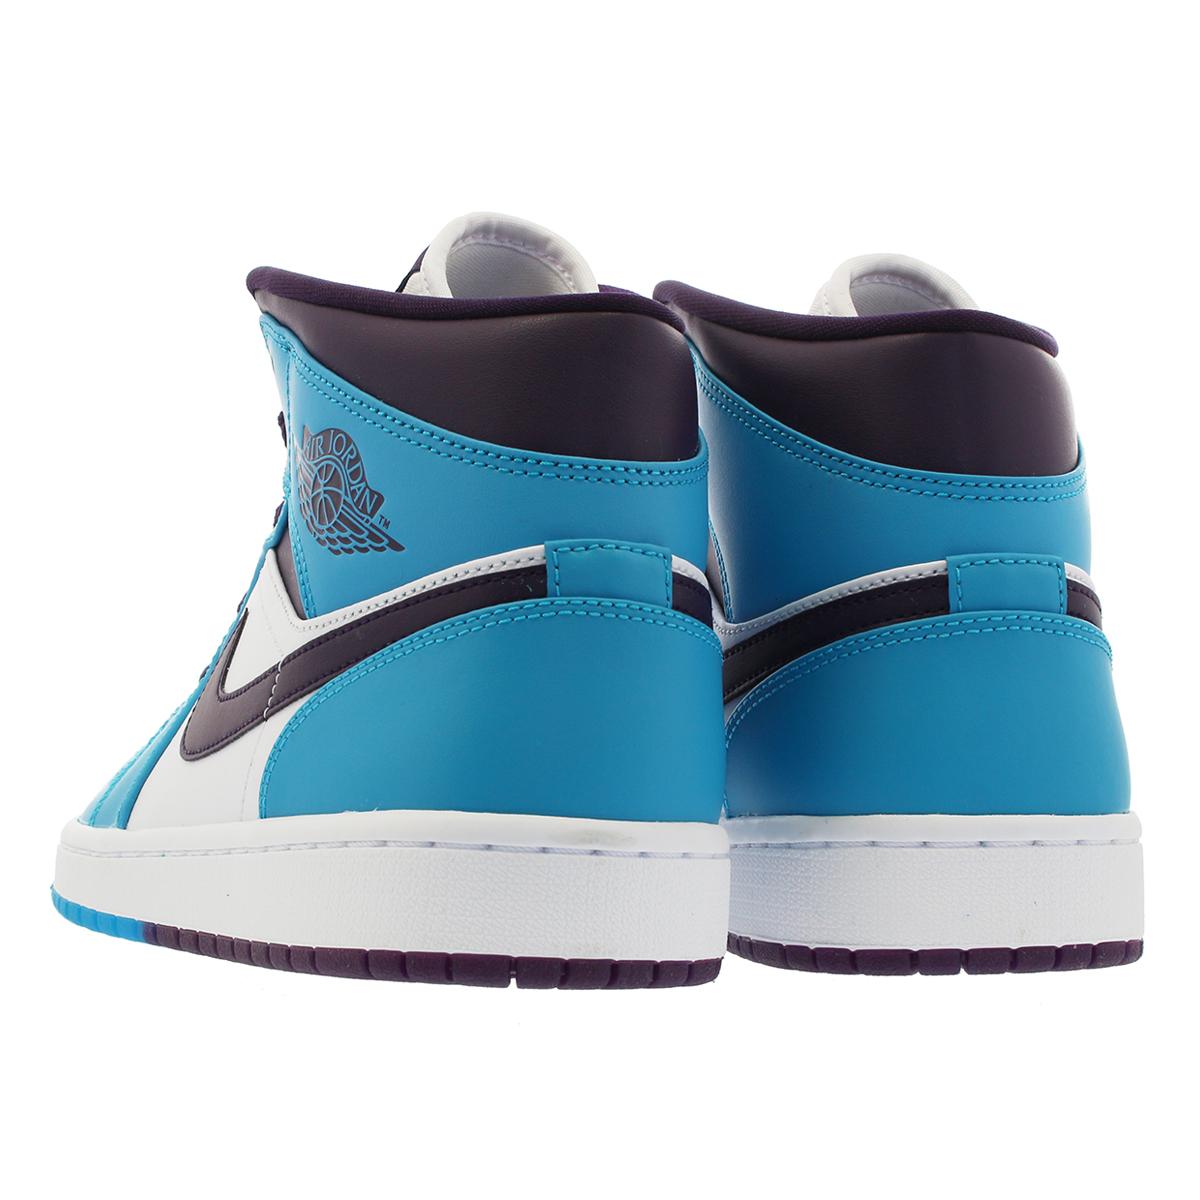 the latest c87ae 16cd7 NIKE AIR JORDAN 1 MID Nike Air Jordan 1 mid BLUE LAGOON GRAND PURPLE WHITE